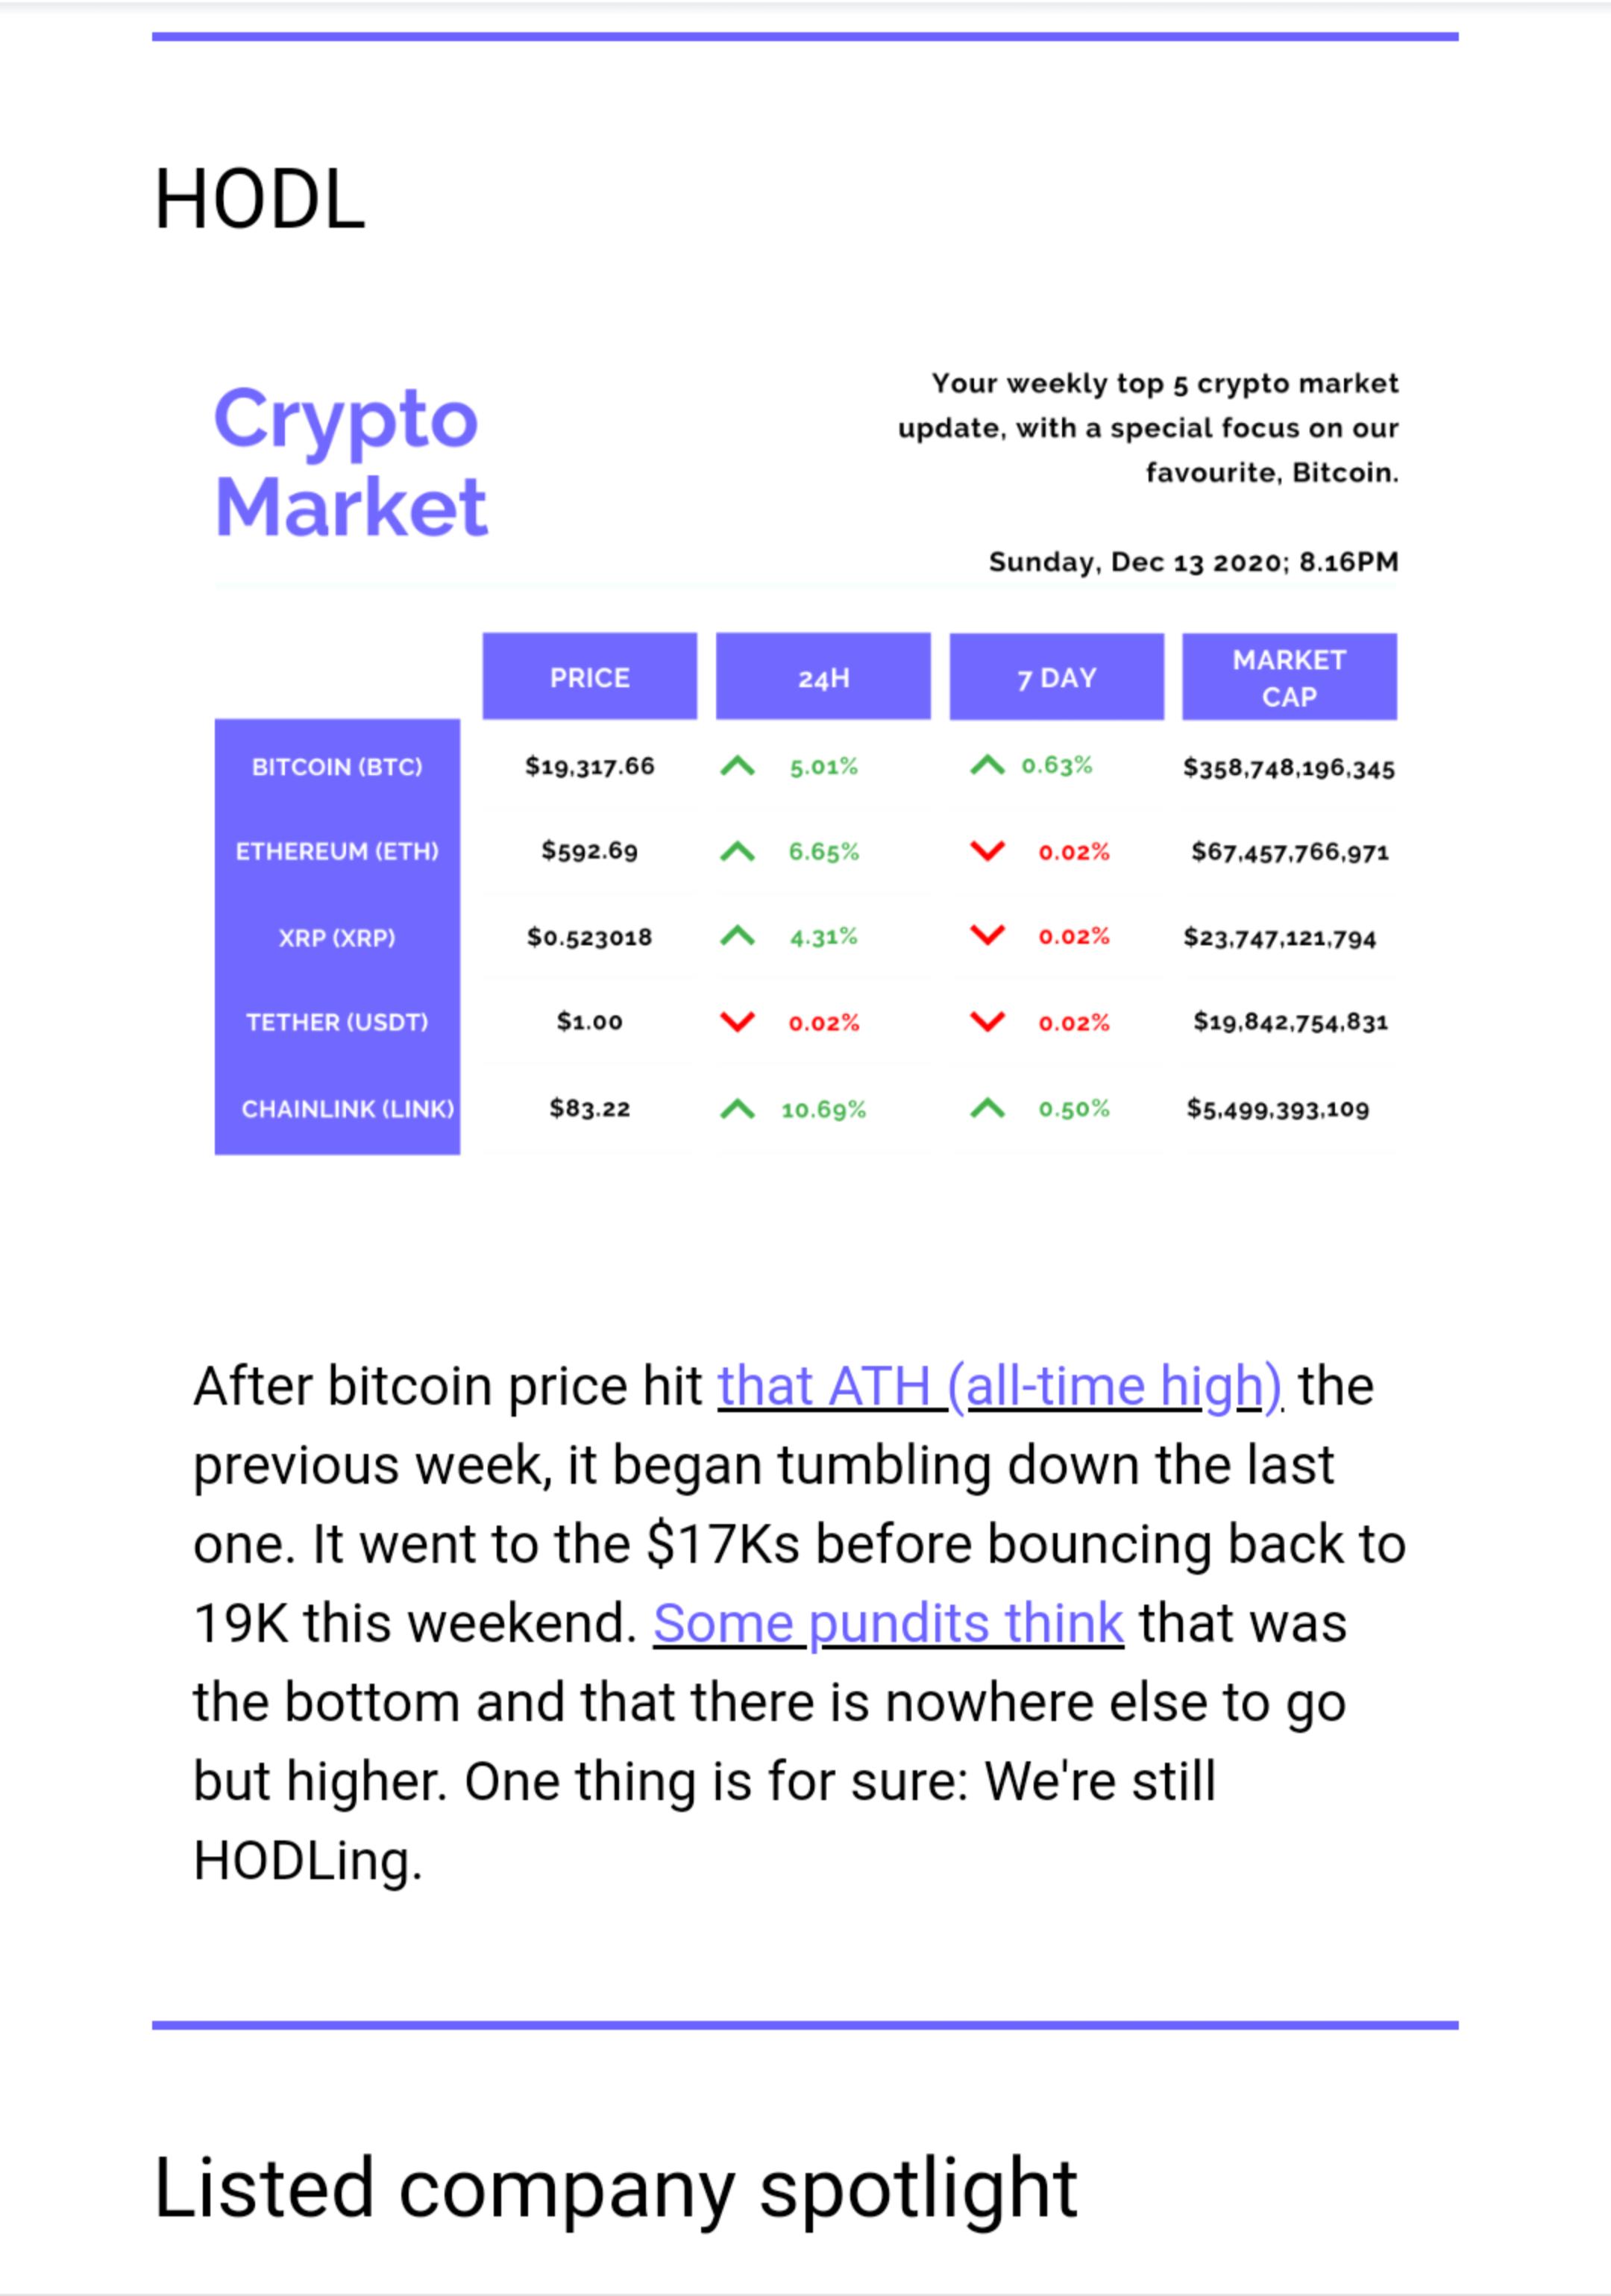 HODL - Crypto - Digipesa Bitcoin Trends